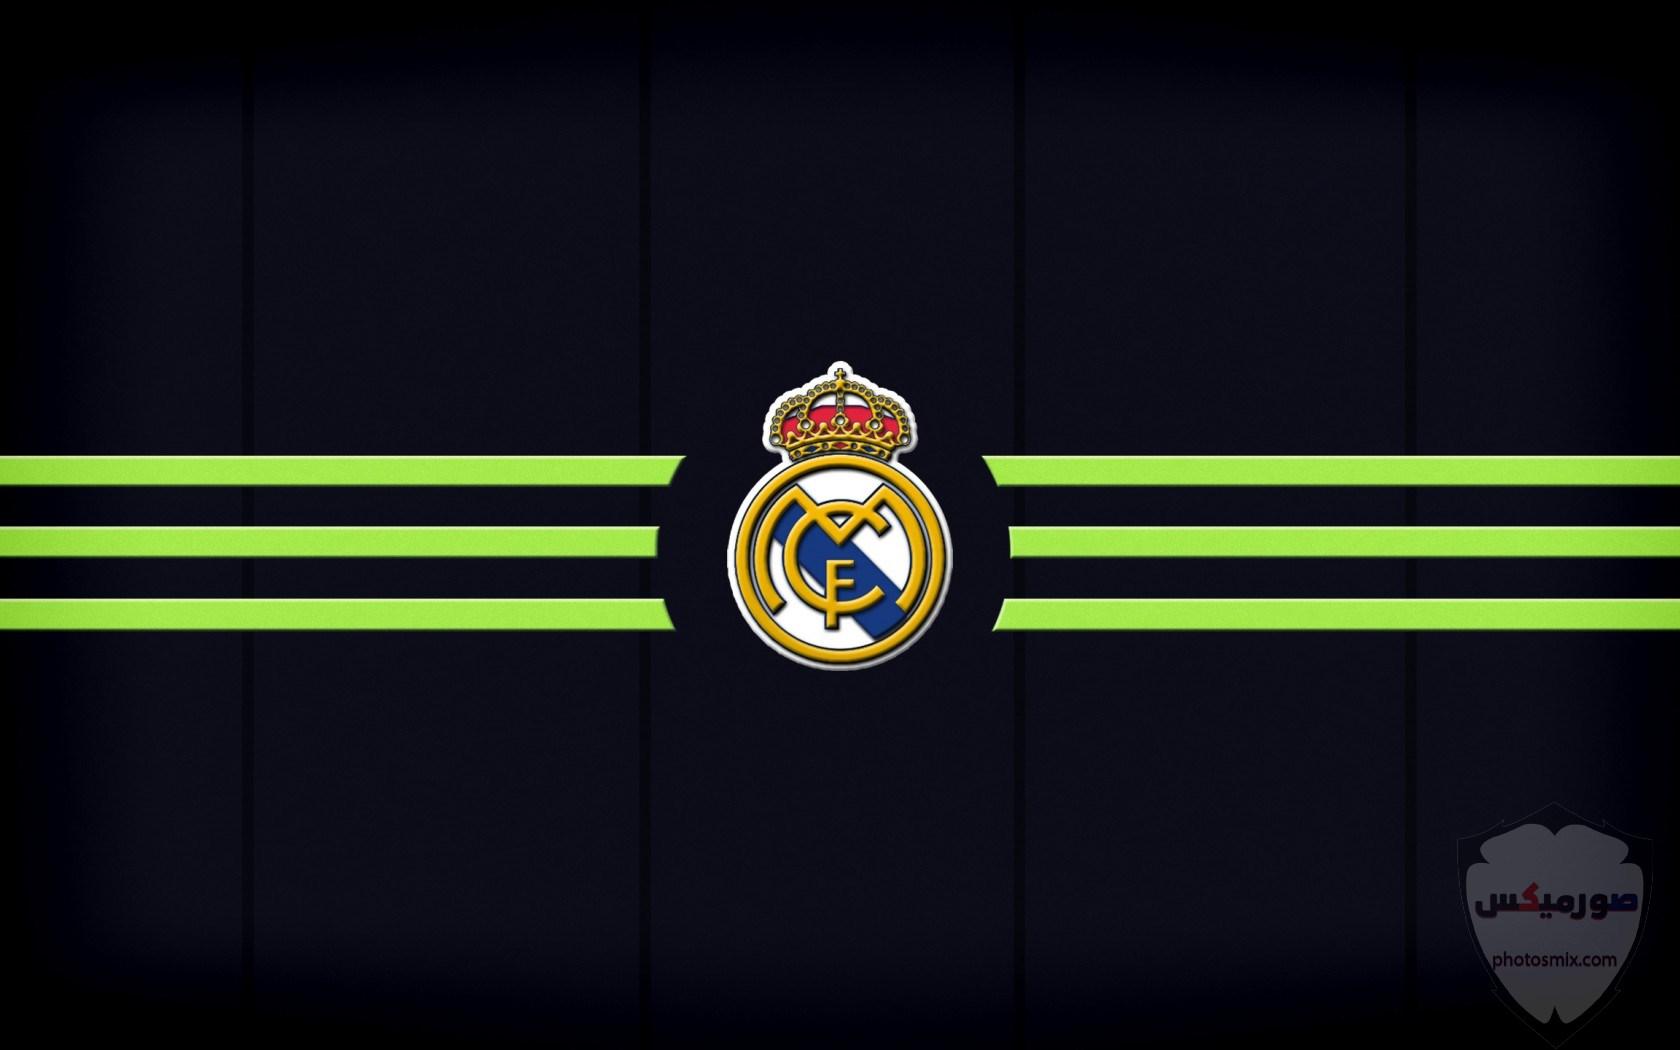 صور ريال مدريد 2020خلفيات ورمزيات ريال مدريد صور لاعبي ريال مدريد real madrid 32